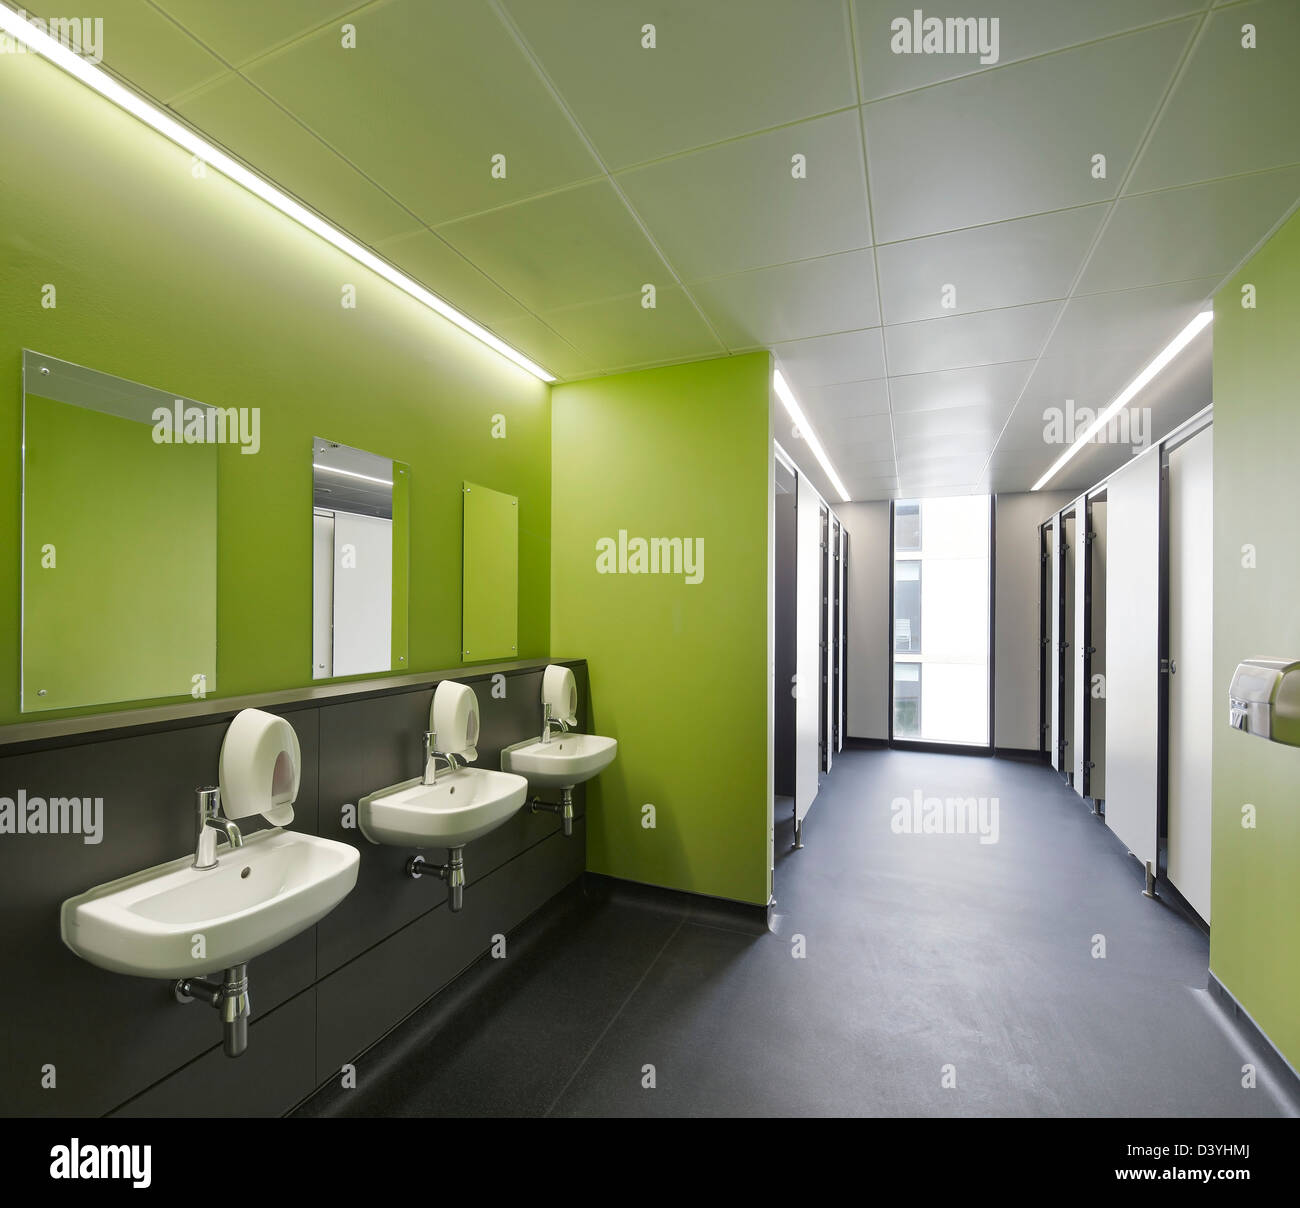 Thomas Tallis School, Greenwich, United Kingdom. Architect: John McAslan & Partners, 2012. Toilet area. - Stock Image